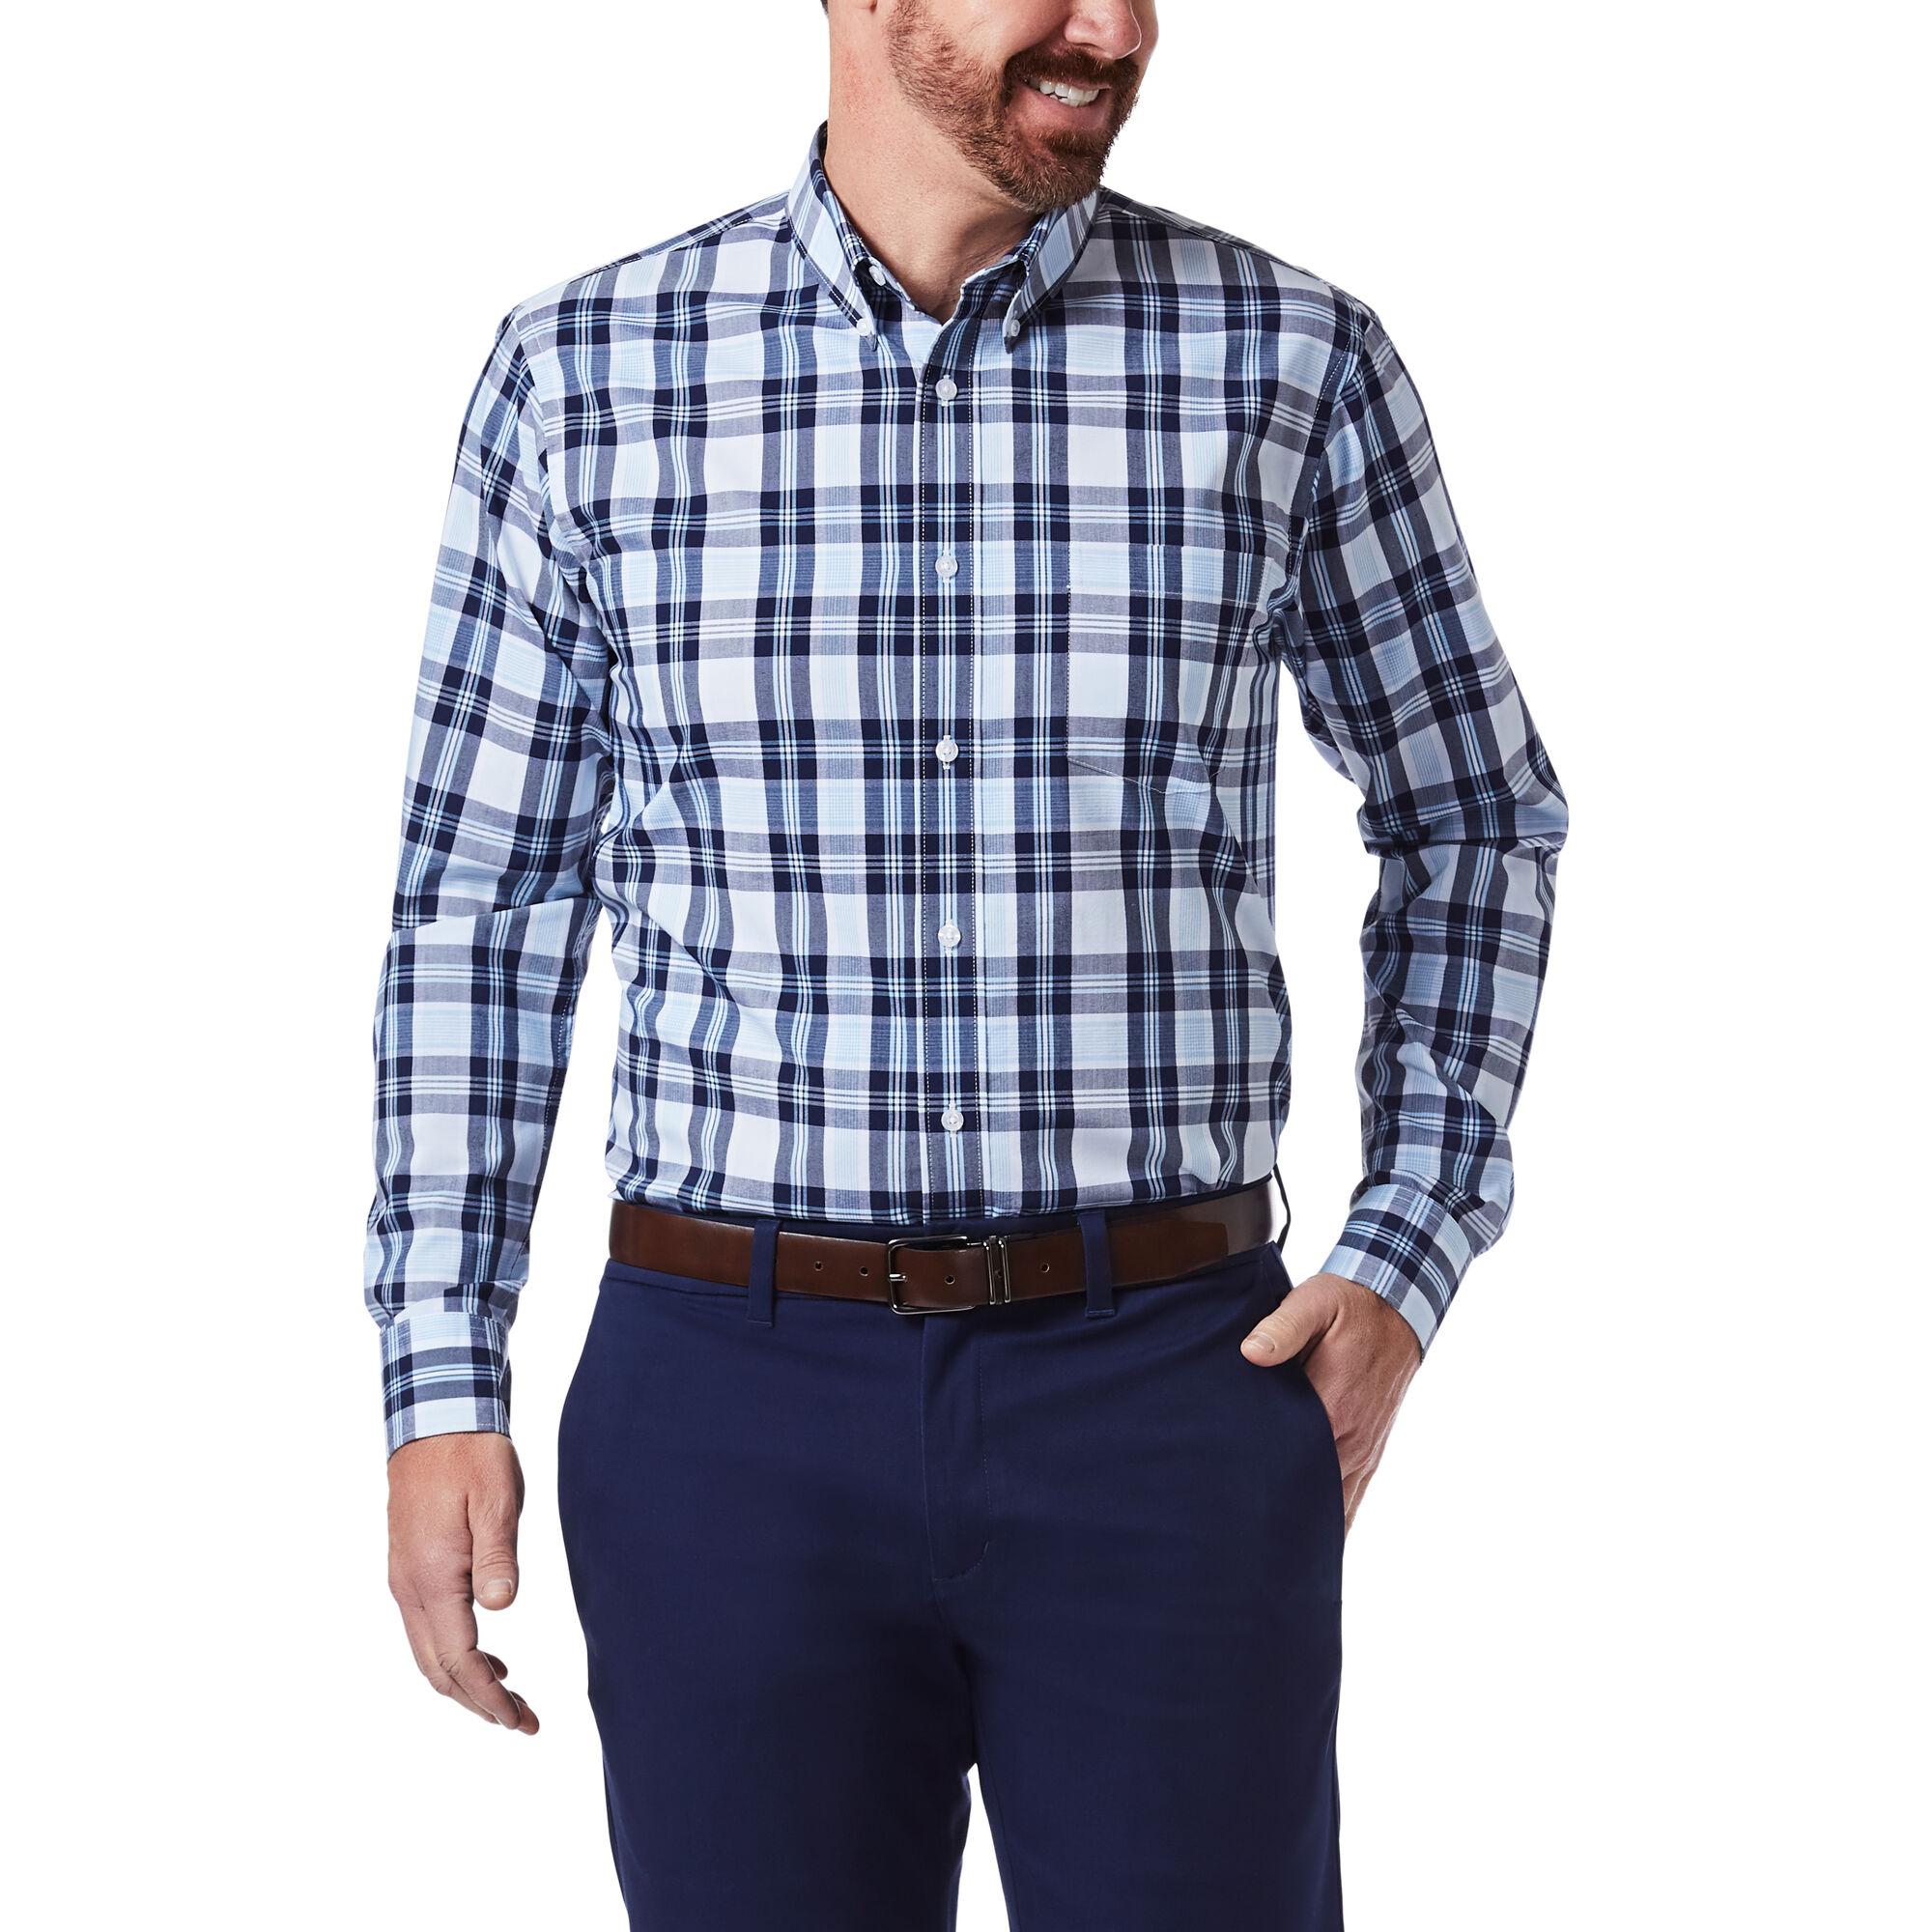 e4557e6a992 Plaid Button Down Shirt